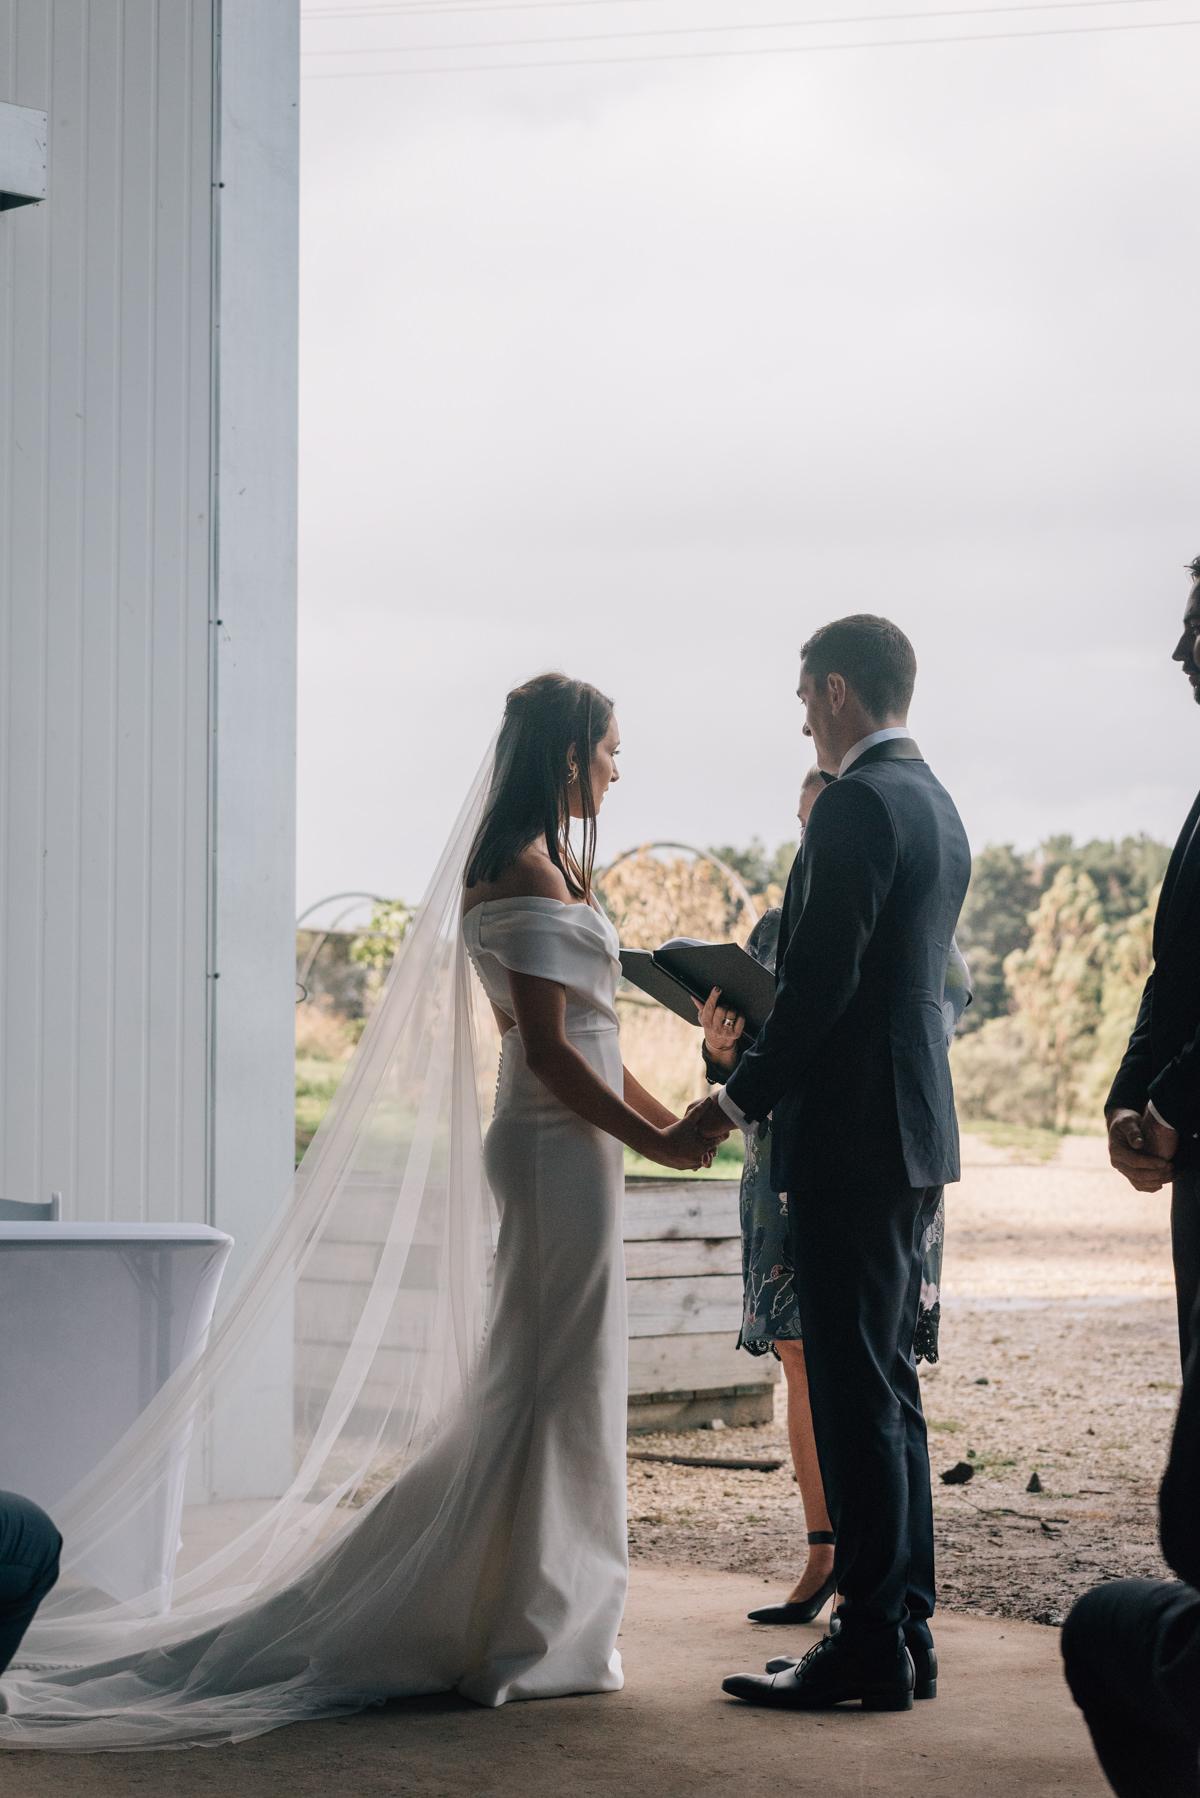 Wedding-Photohraphy-Launceston-Wines-For-Joanie-30.jpg